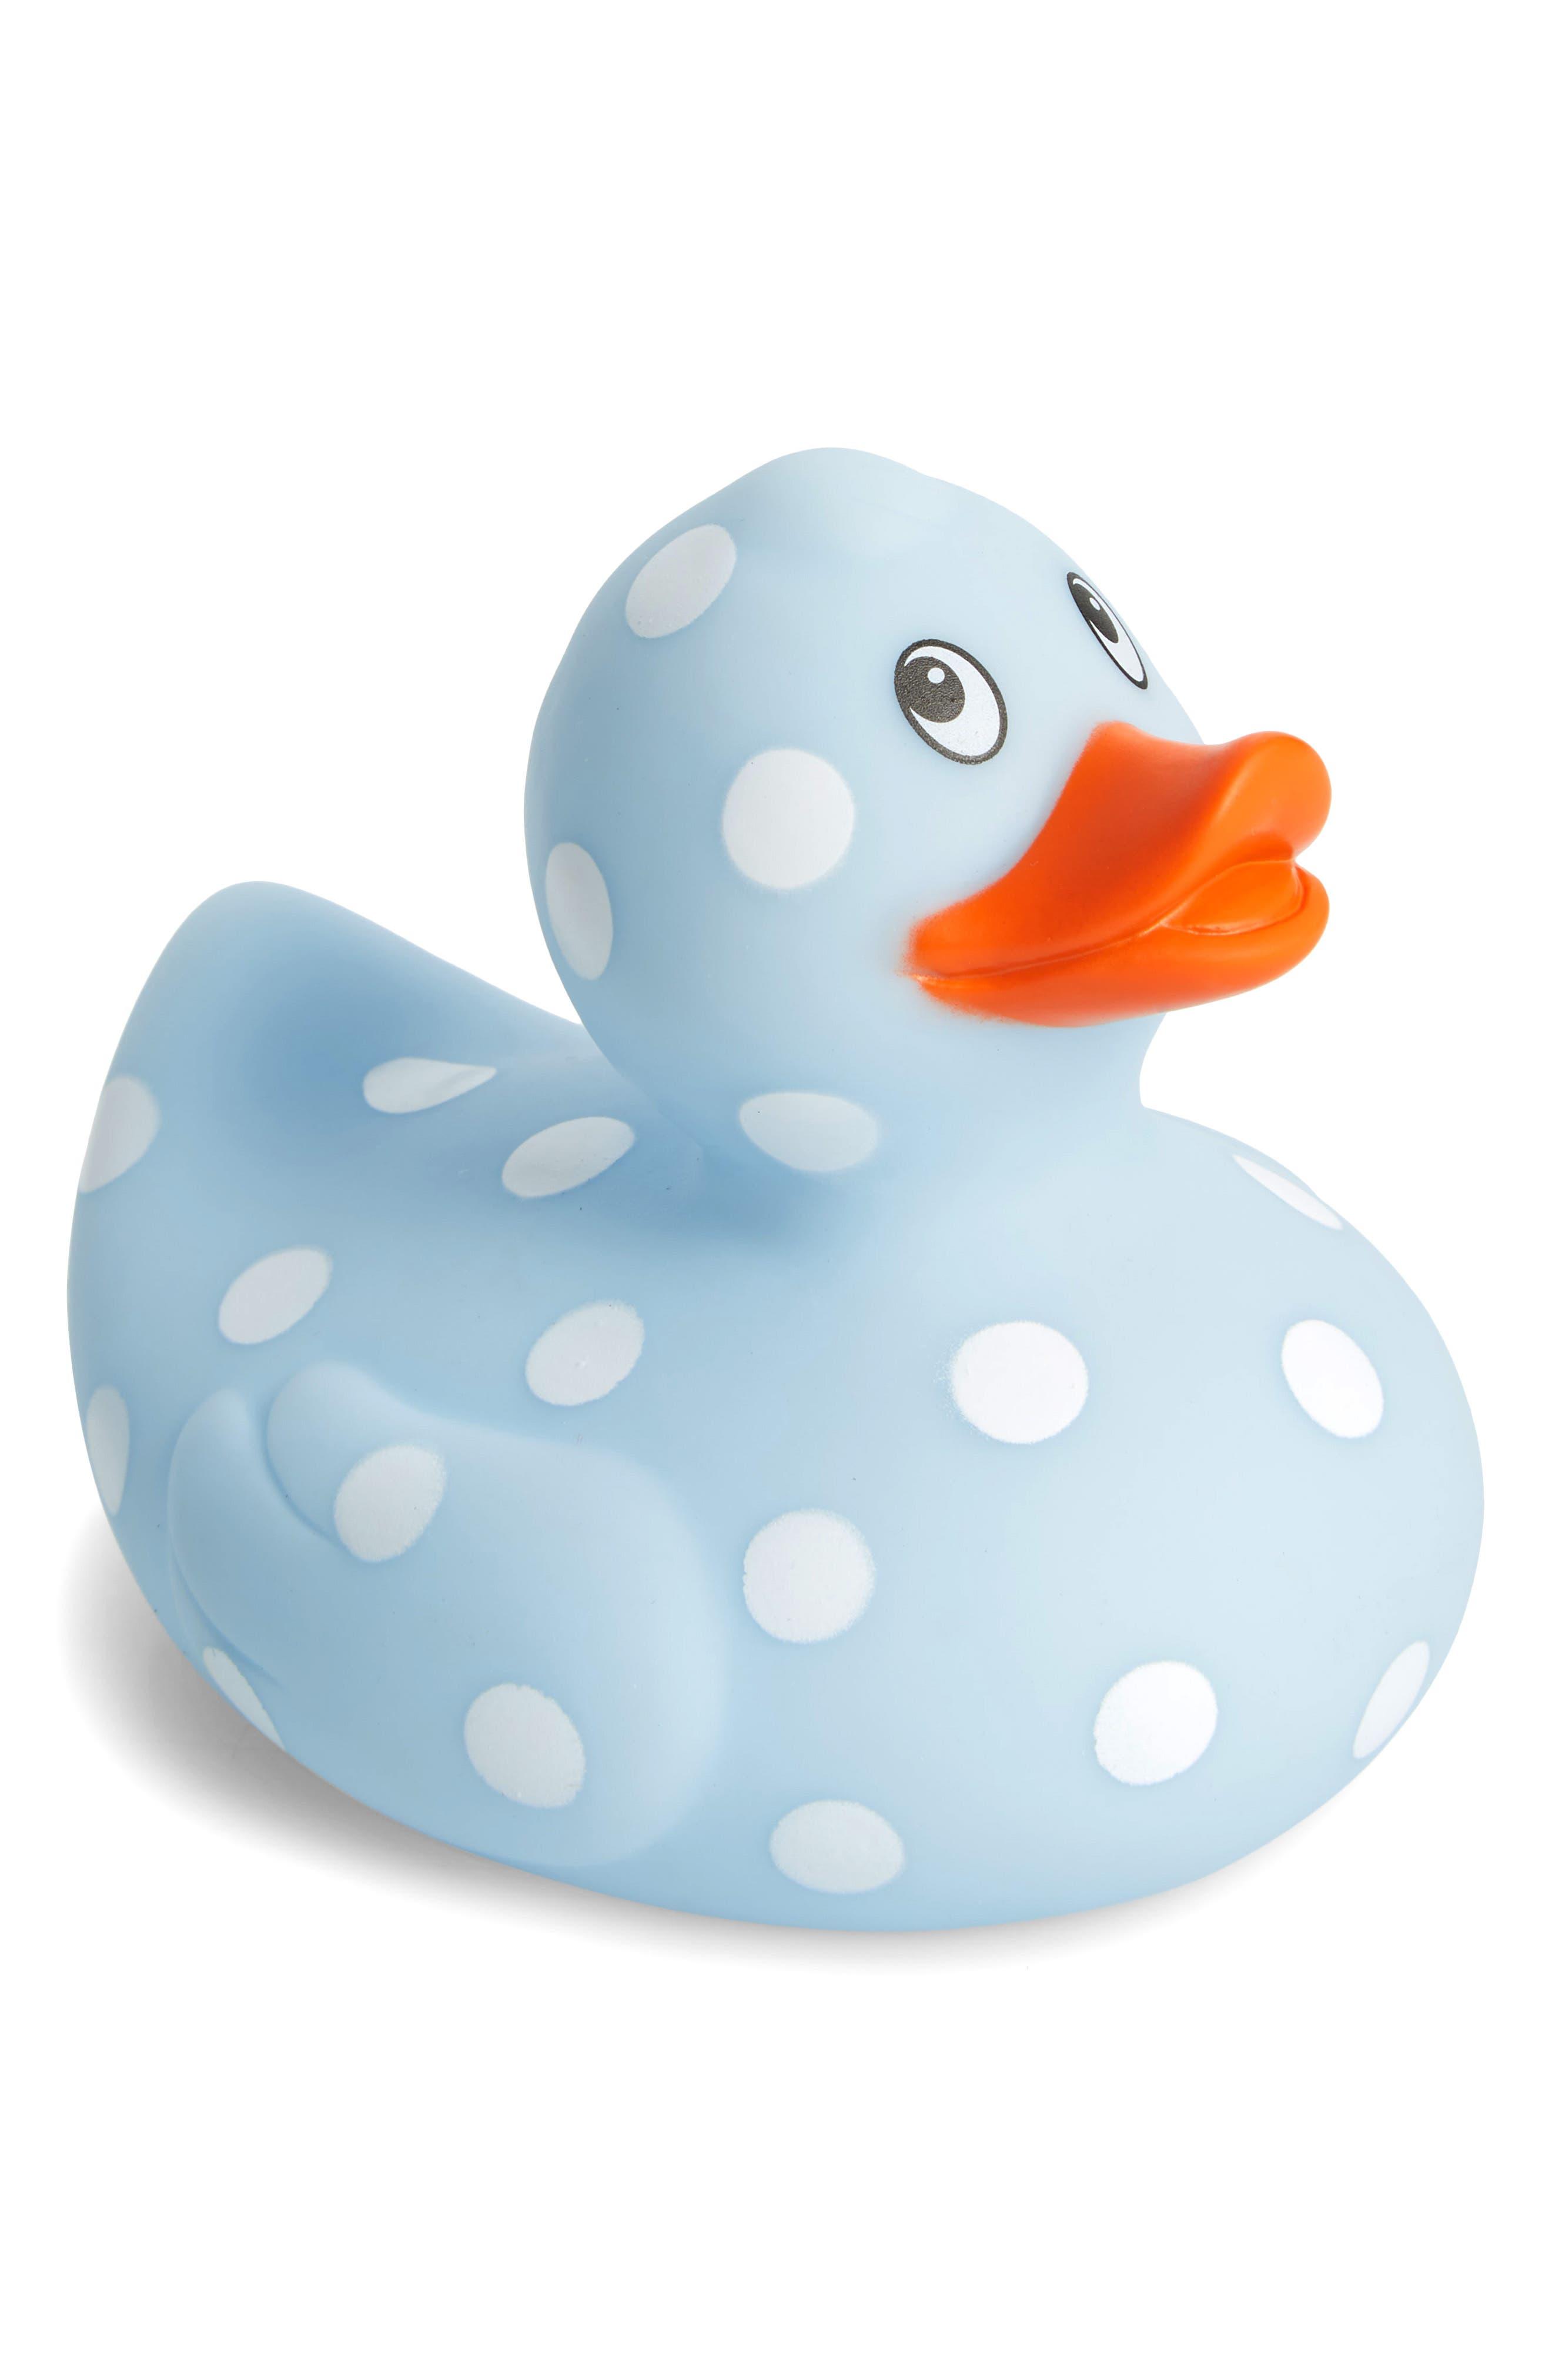 Blue Polka Dot Rubber Duck Bath Toy,                             Main thumbnail 1, color,                             Light Blue